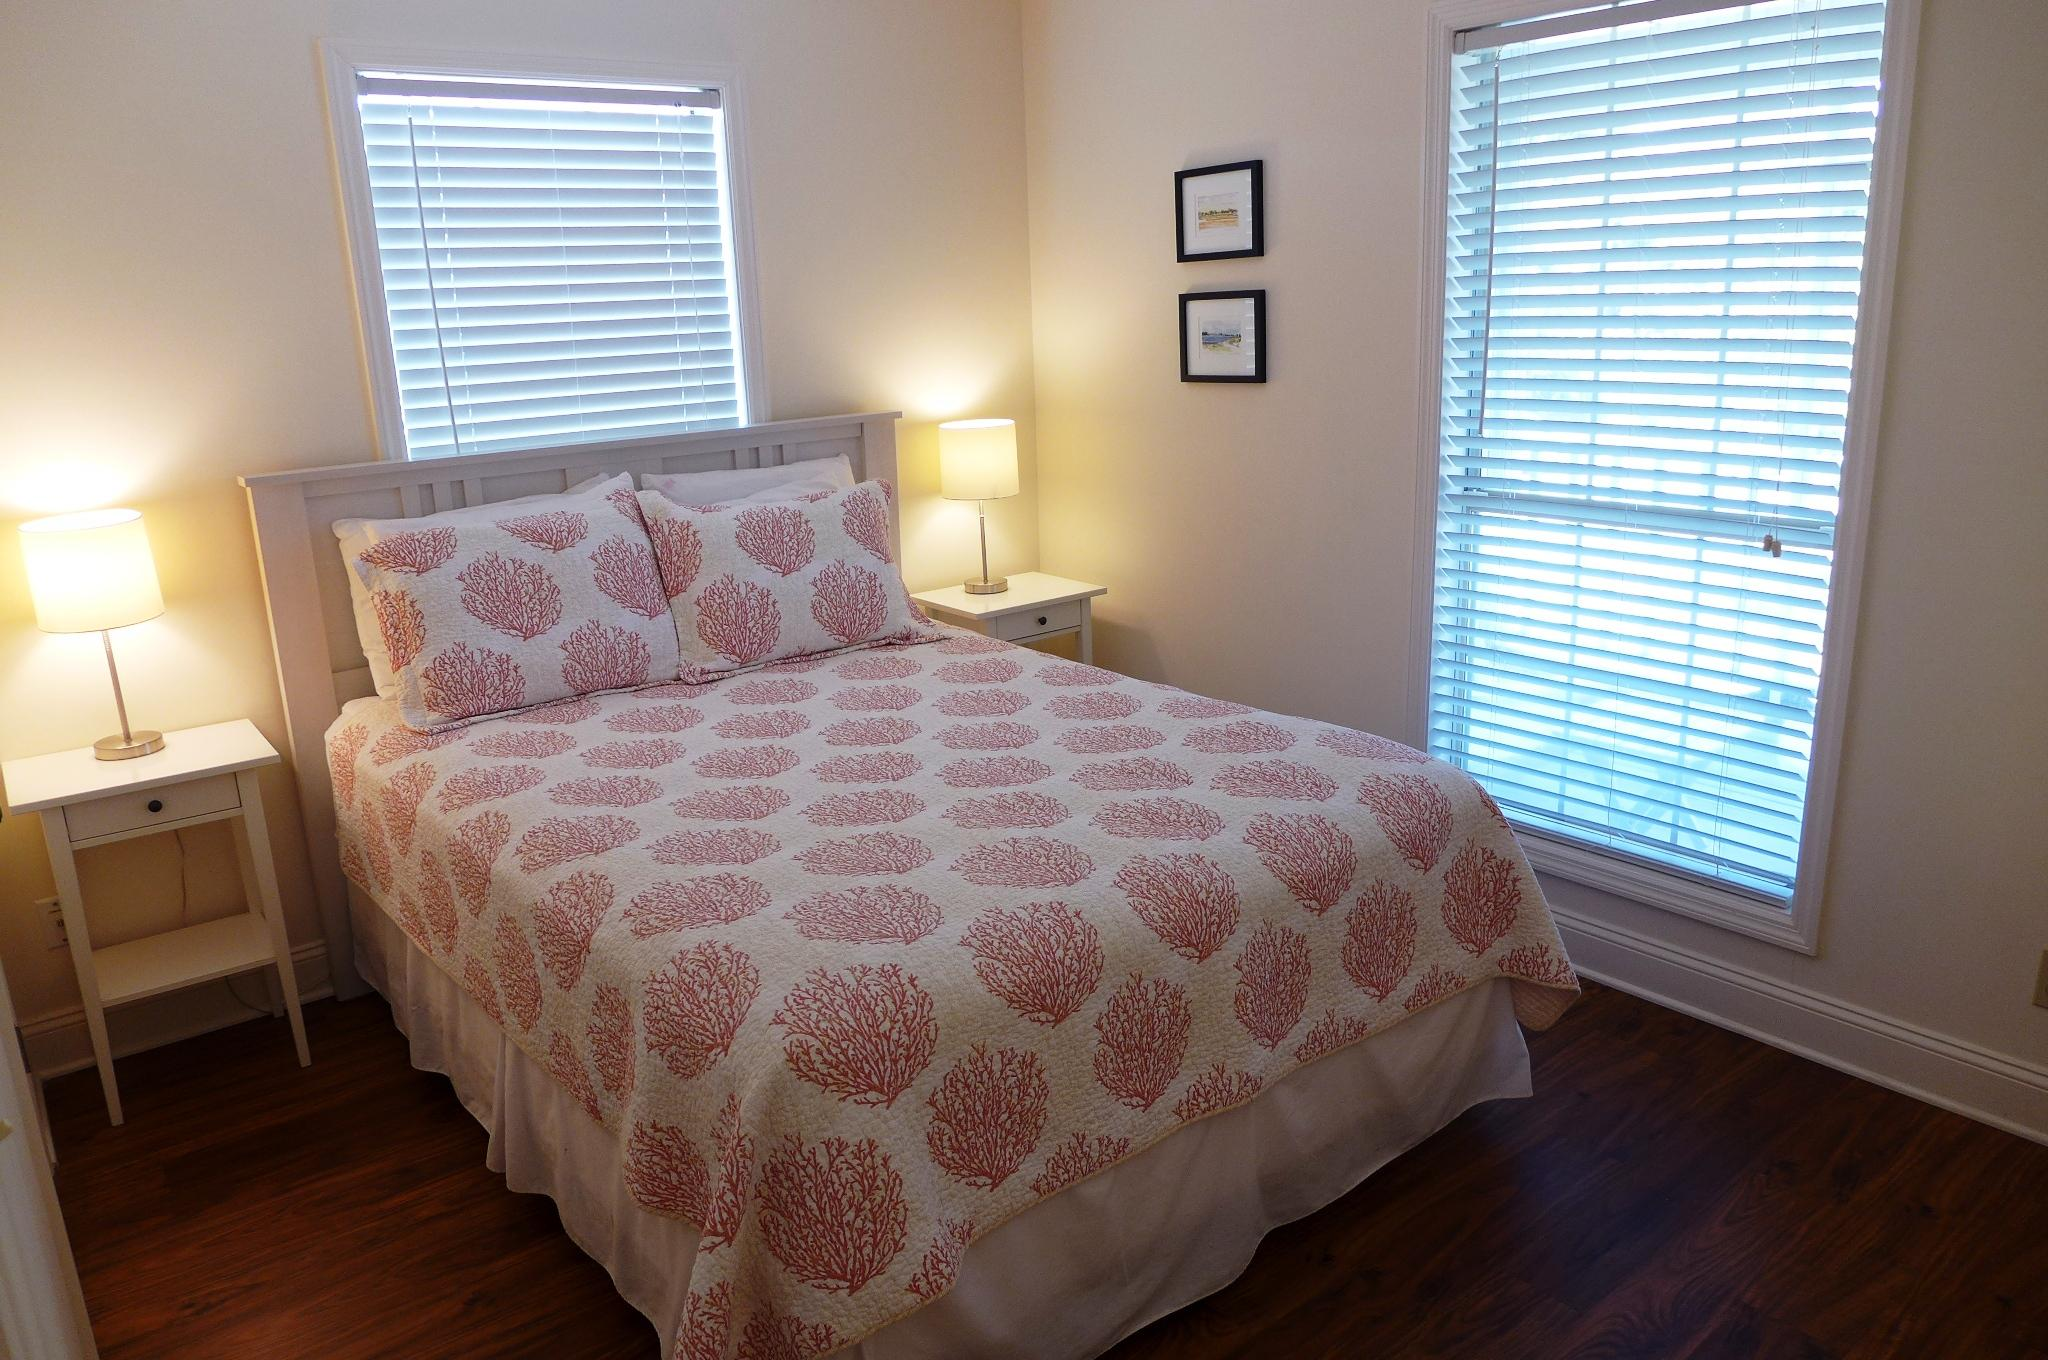 Edisto Beach Homes For Sale - 2202 Myrtle, Edisto Beach, SC - 6